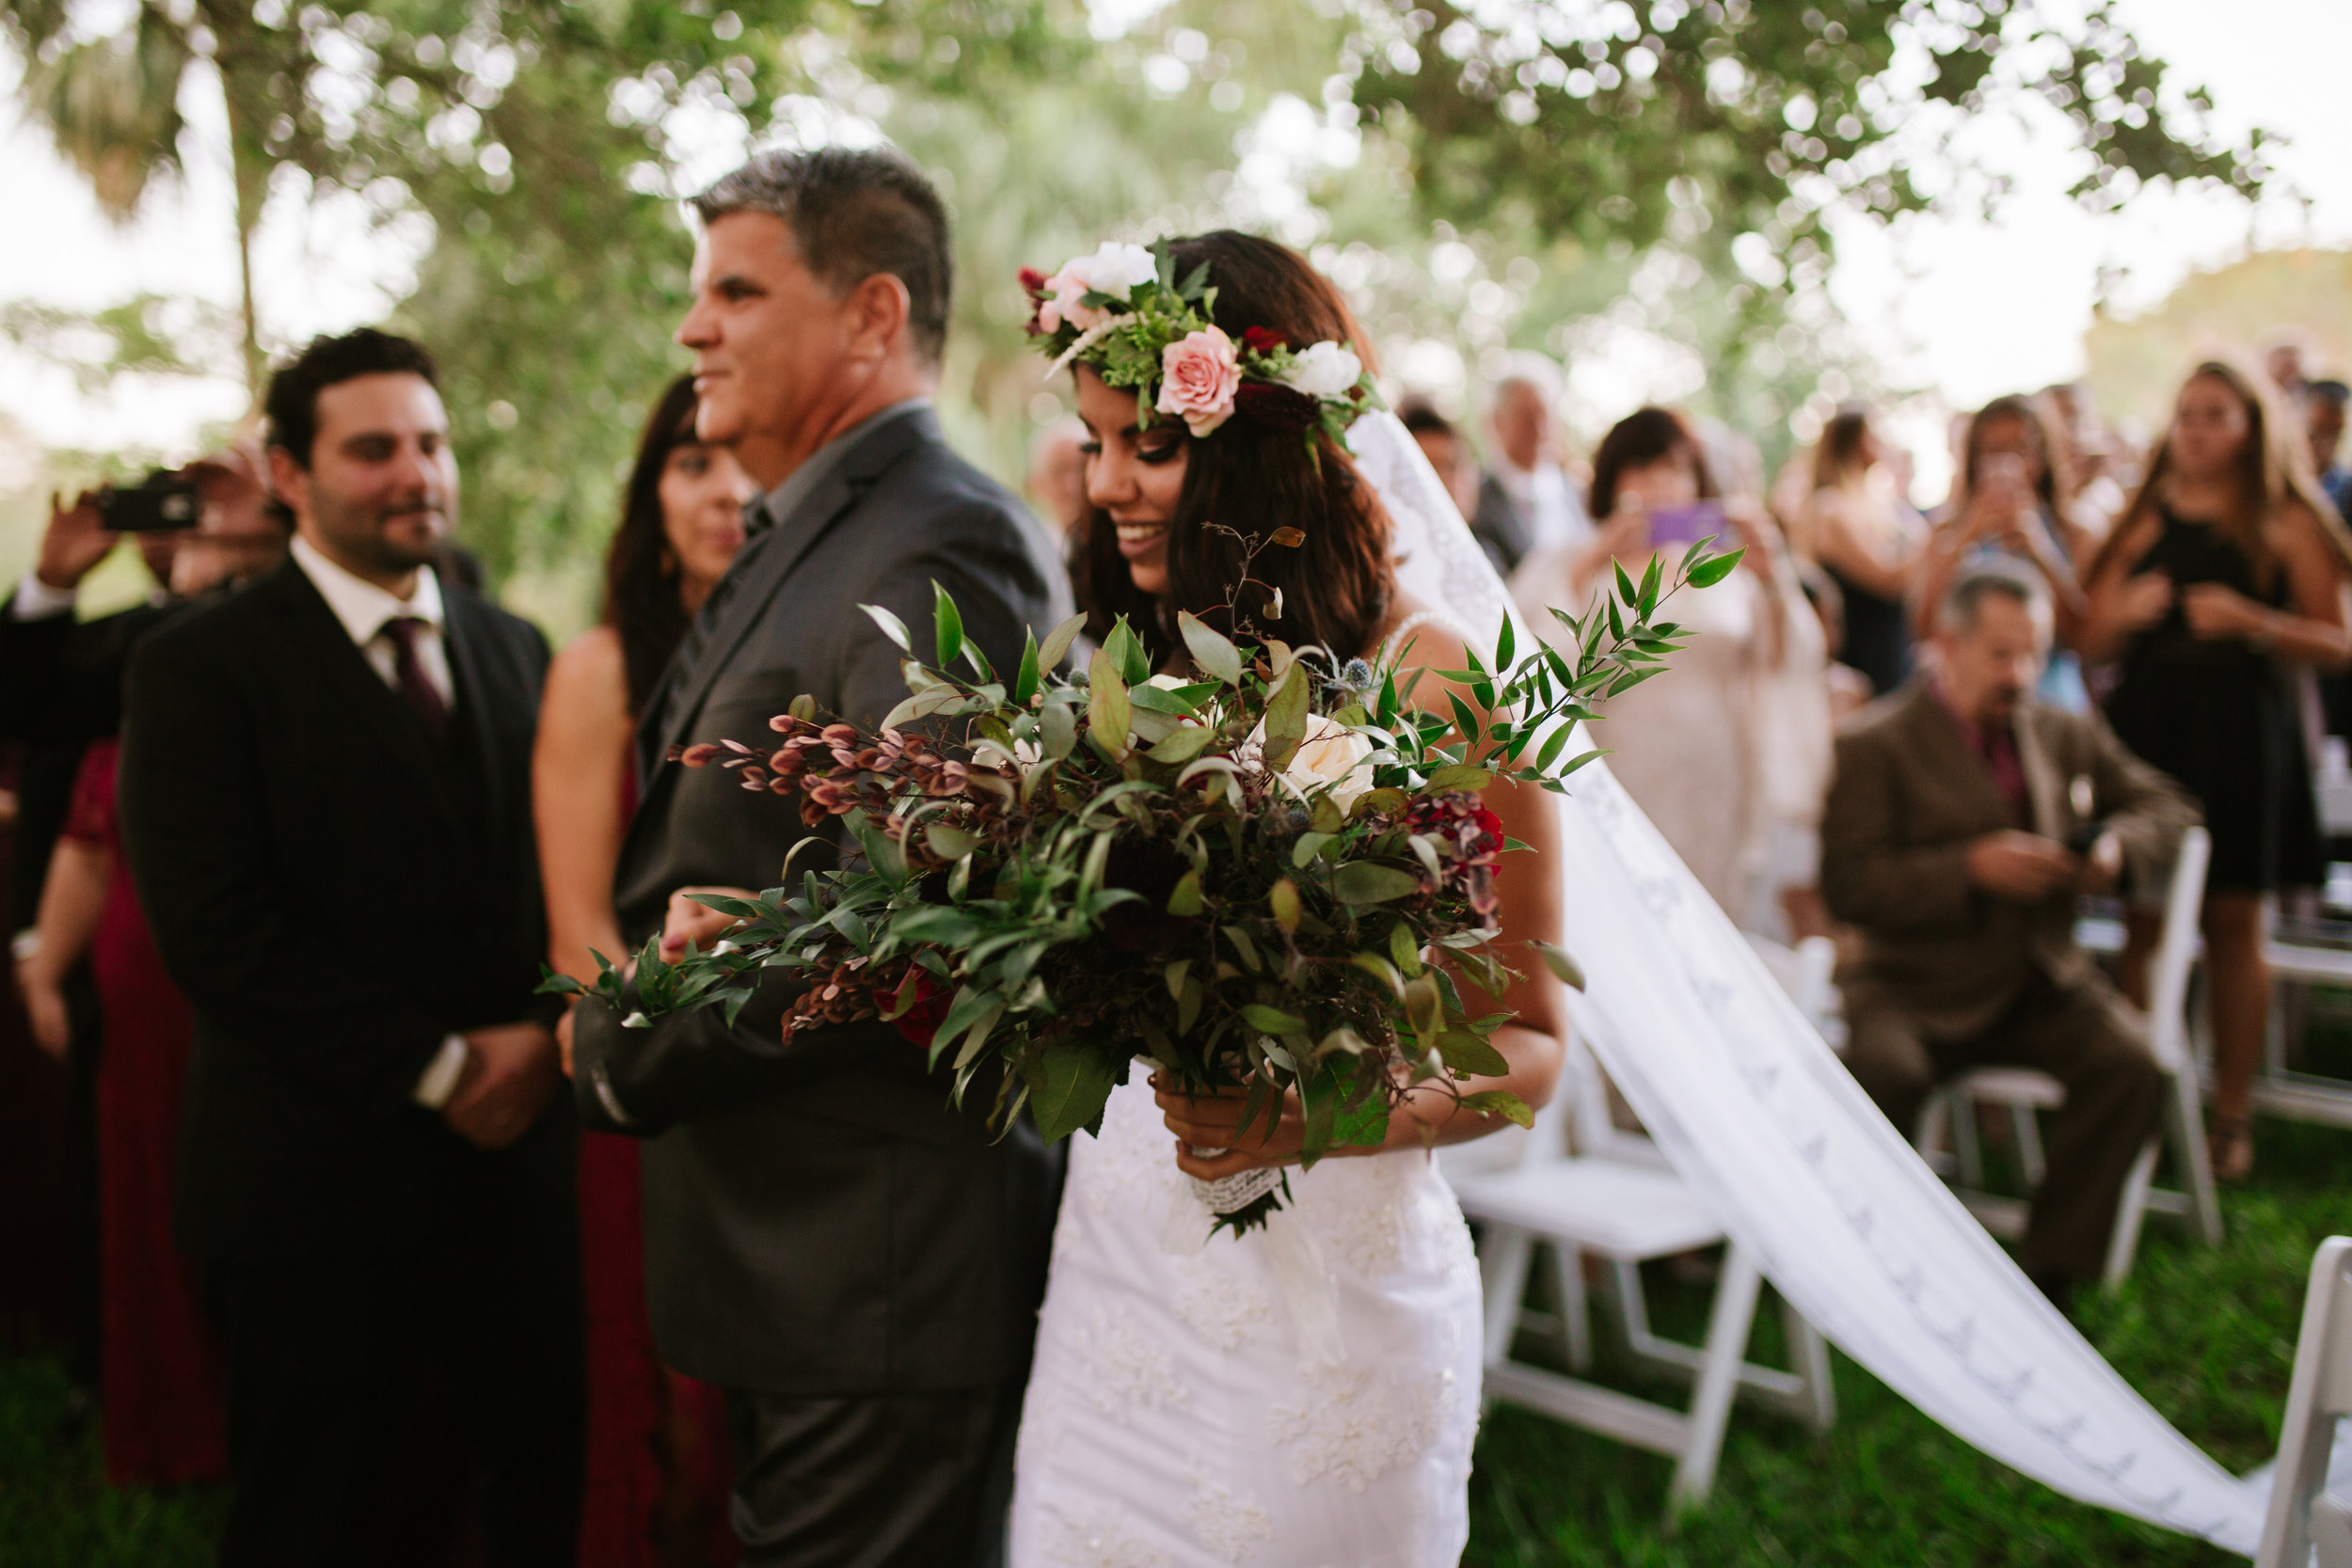 2017.05.23 Barbara and Mauricio Sales Port St Lucie Wedding (356 of 772).jpg